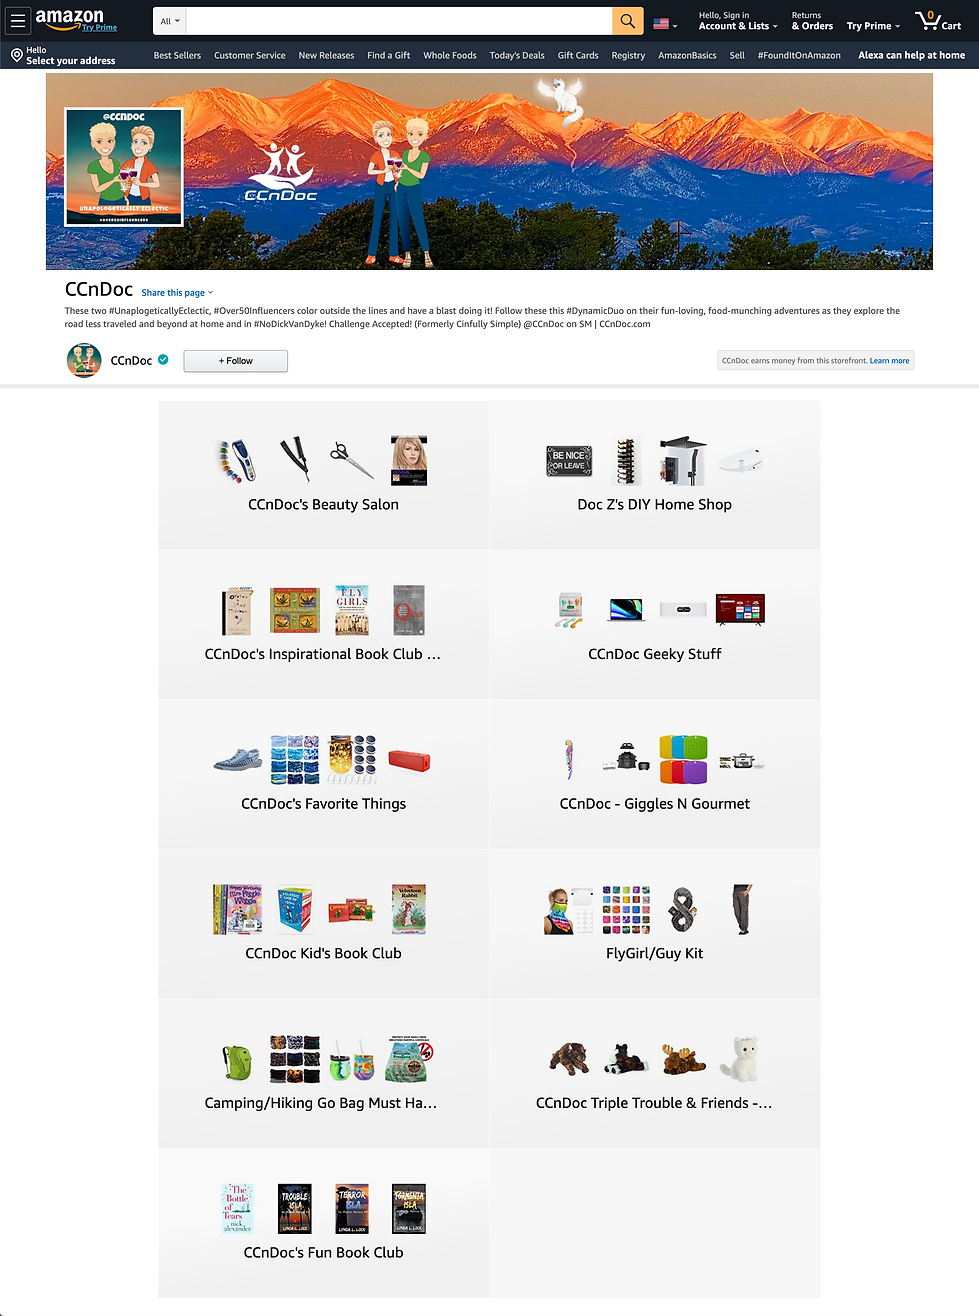 CCnDoc Amazon Influencer Store.png